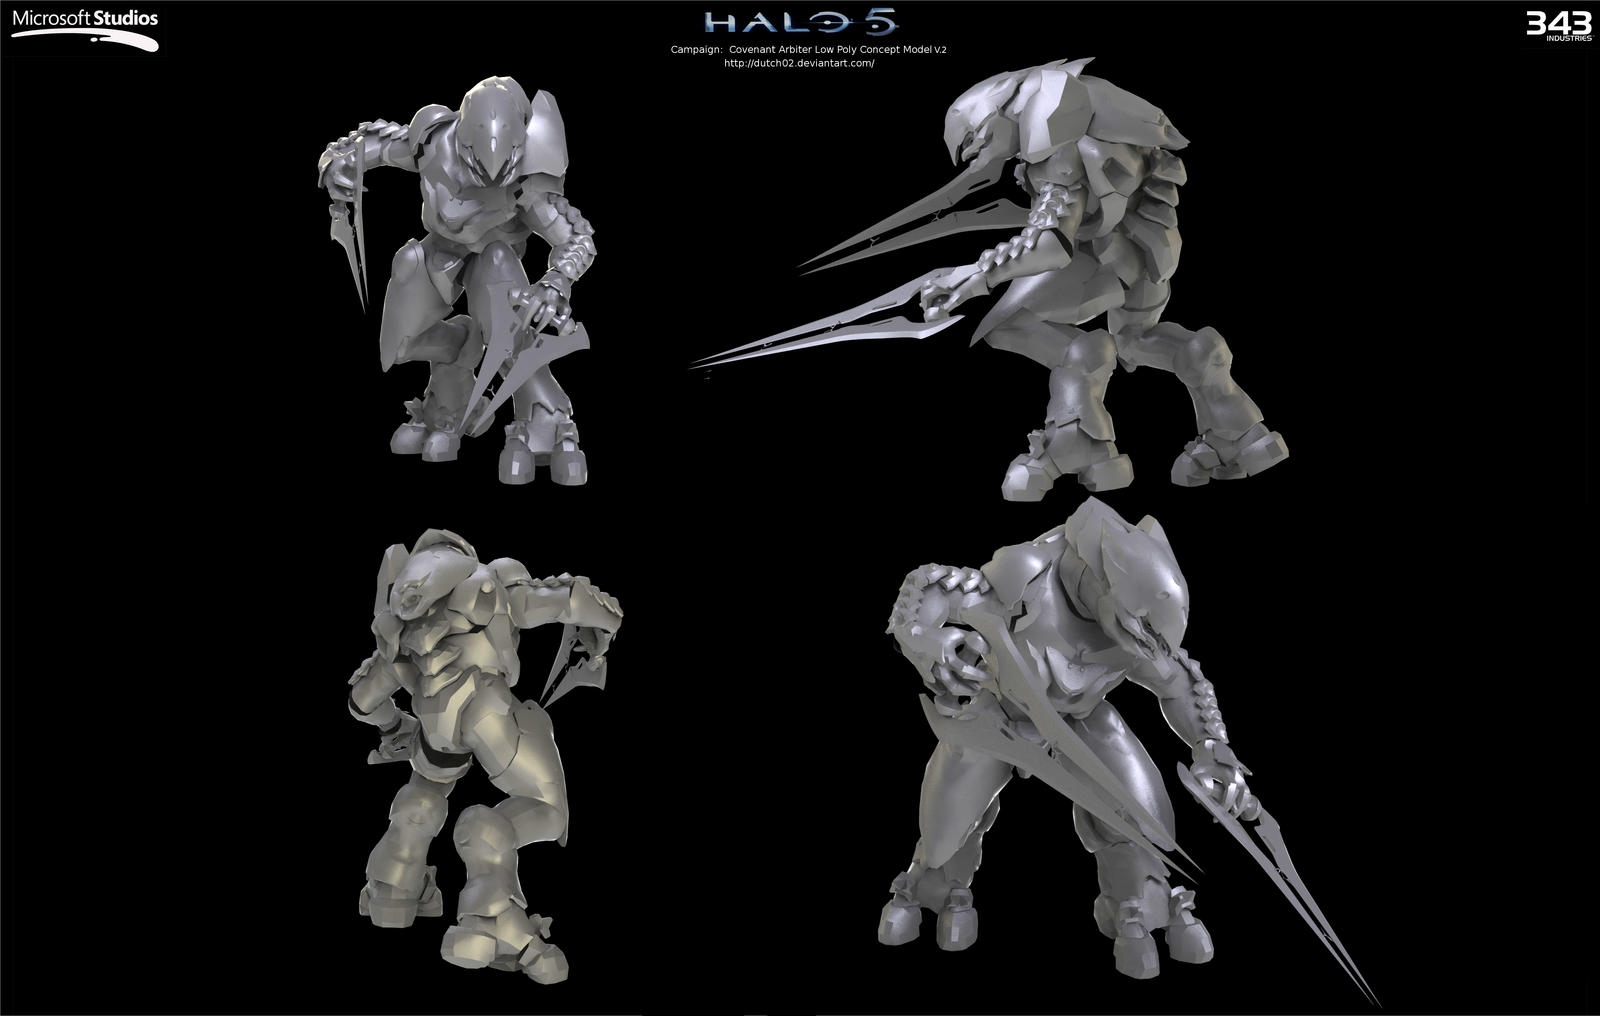 Halo arbiter armor consider, that